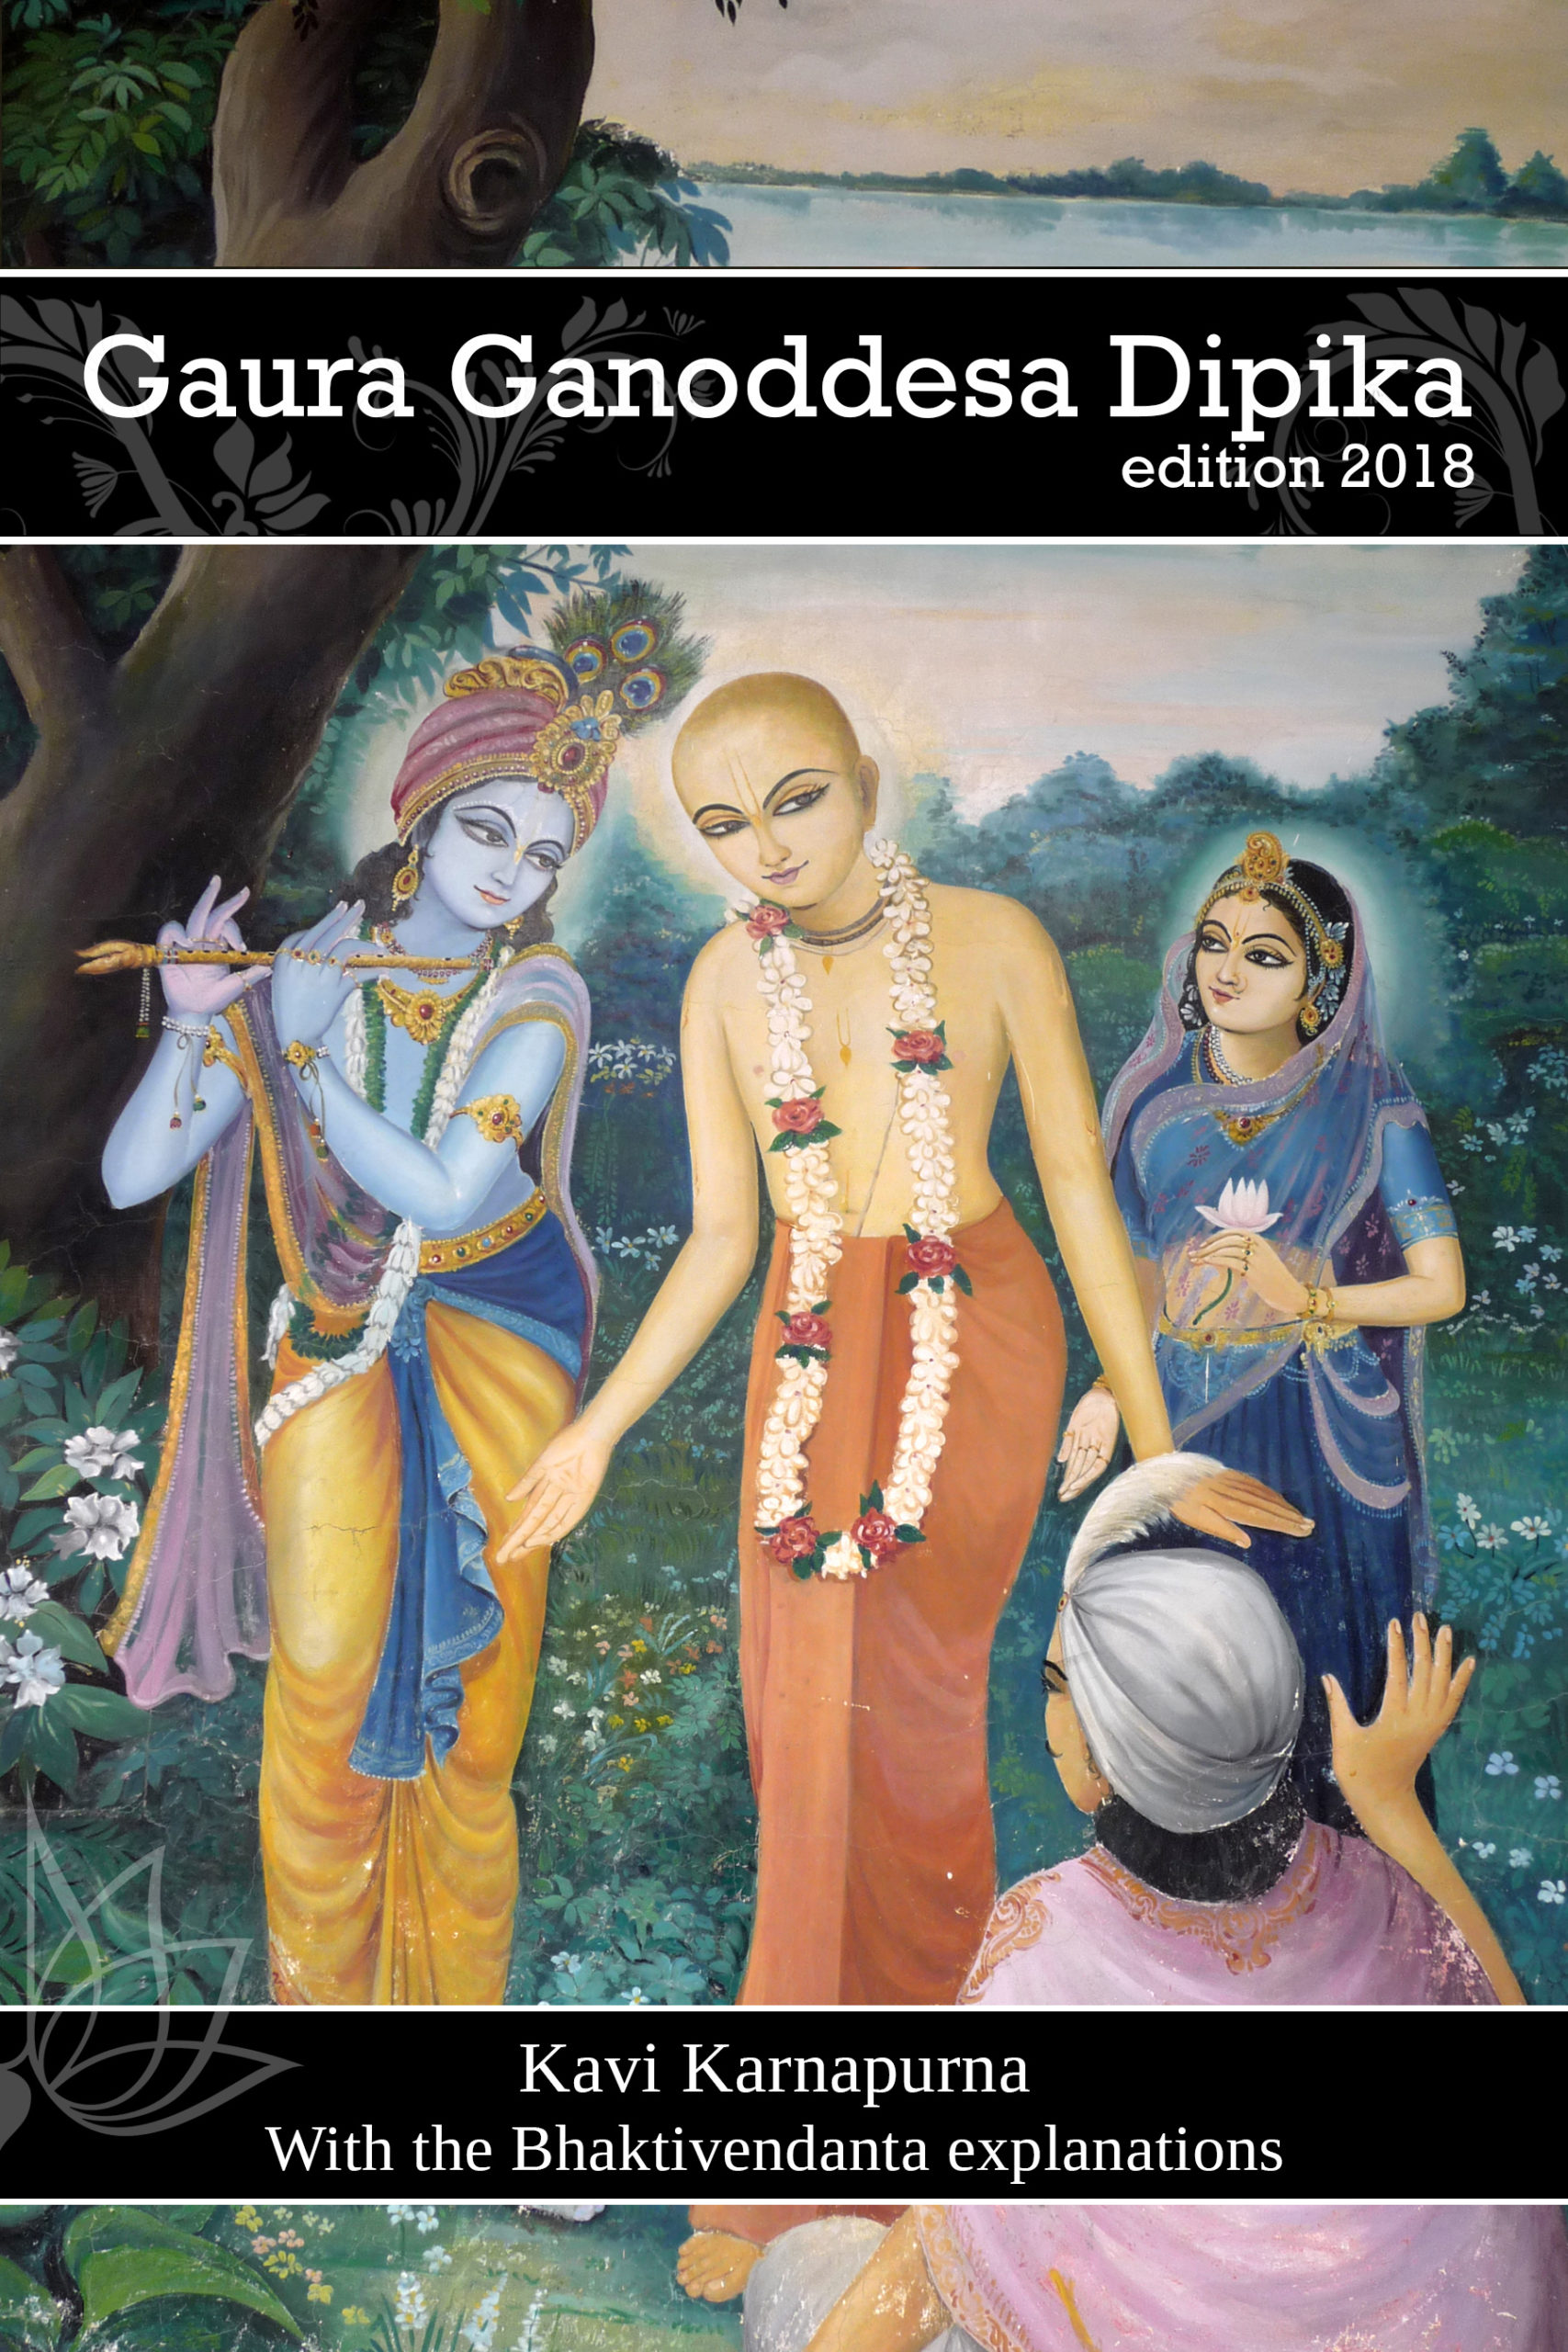 Sri Gaura Ganoddesa Dipika (English) Kindle